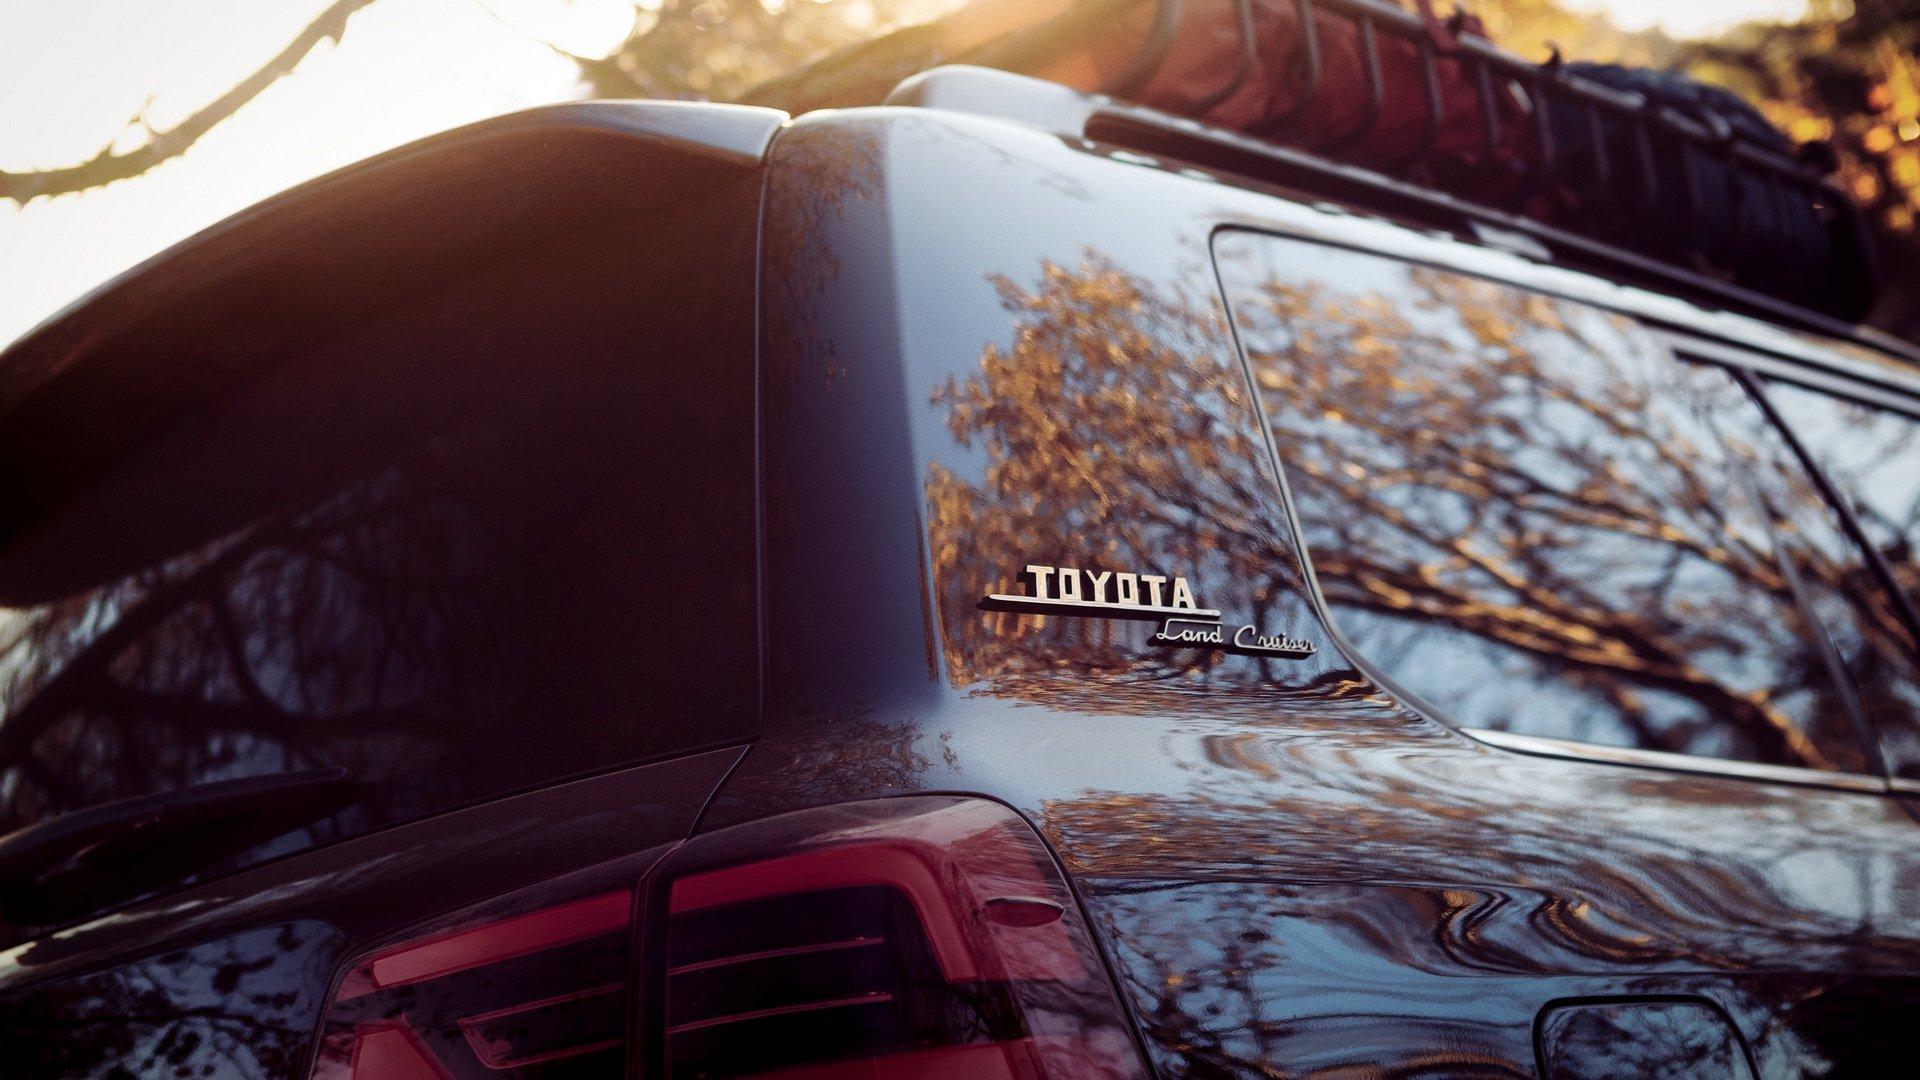 toyota-land-cruiser-heritage-edition-2020-–-vinh-danh-mot-huyen-thoai